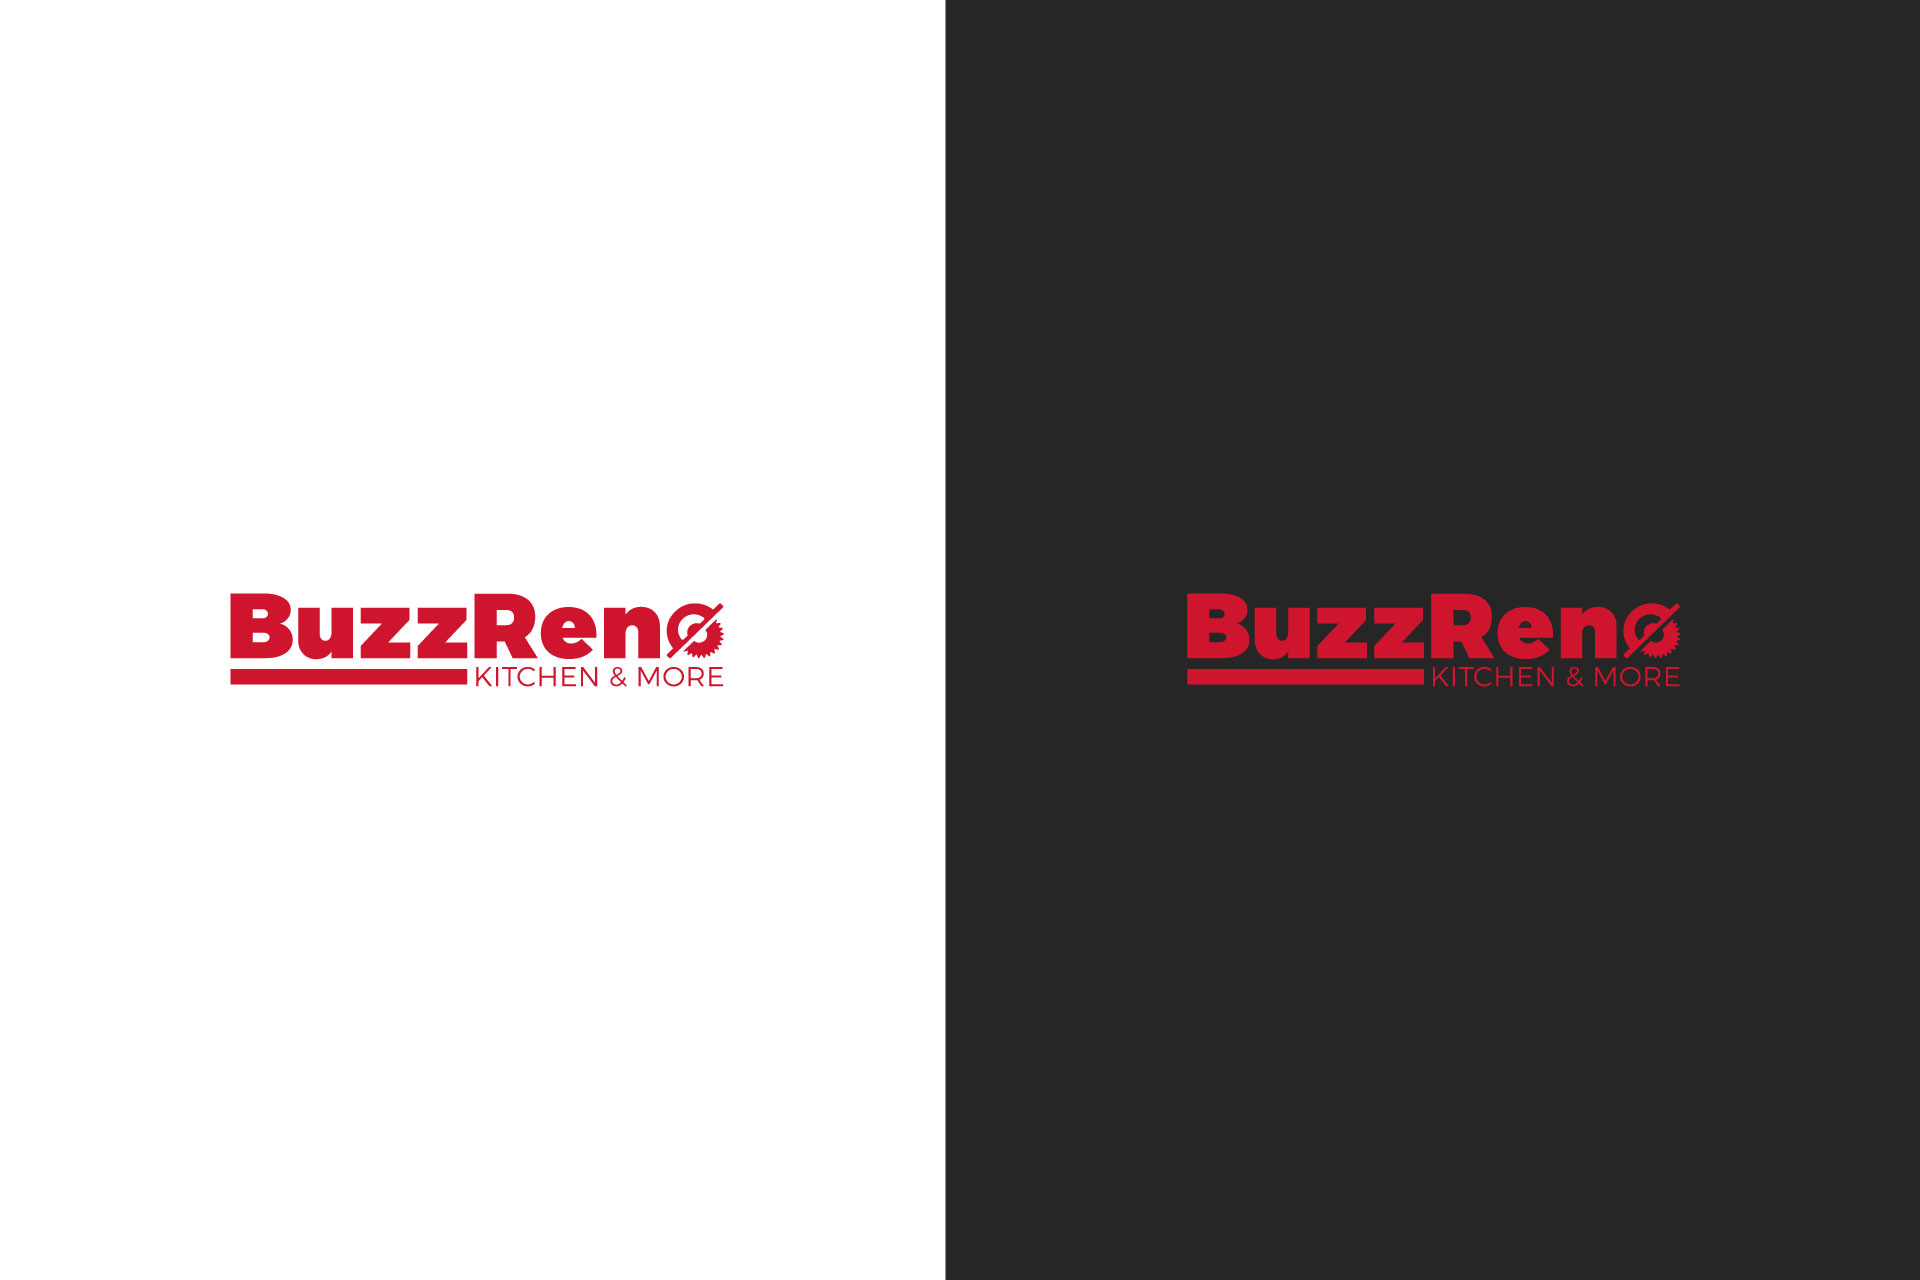 BuzzReno construction company branding by Z Creative Studio Branding & Graphic Design Melbourne